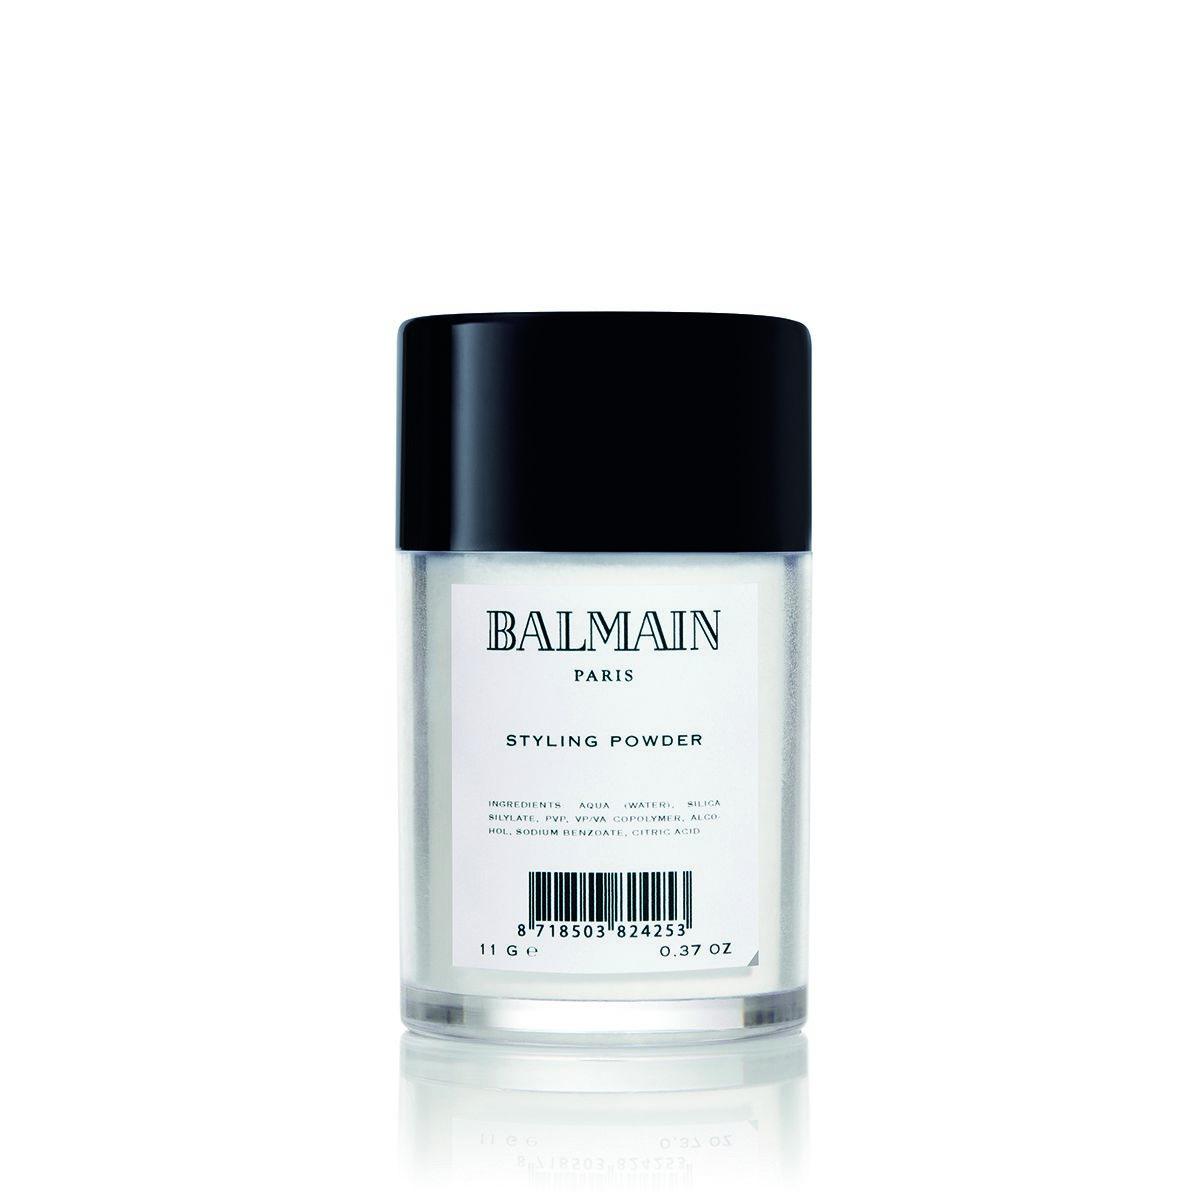 266acbdc Photo of Styling Powder 11g by Balmain